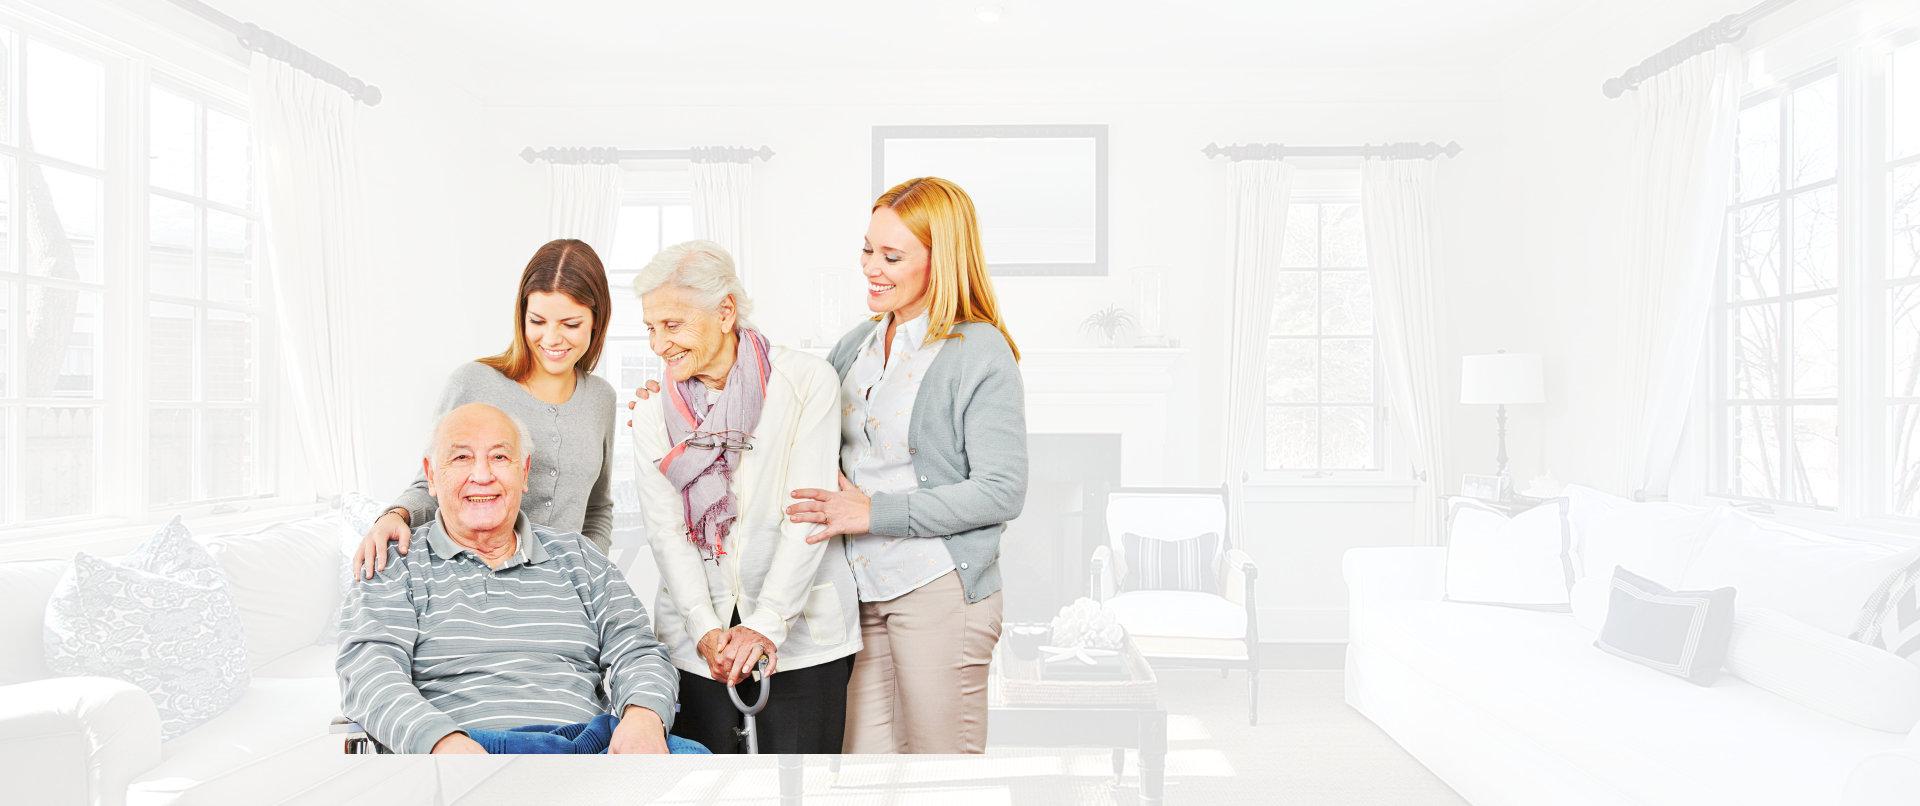 portrait of seniors and caregivers